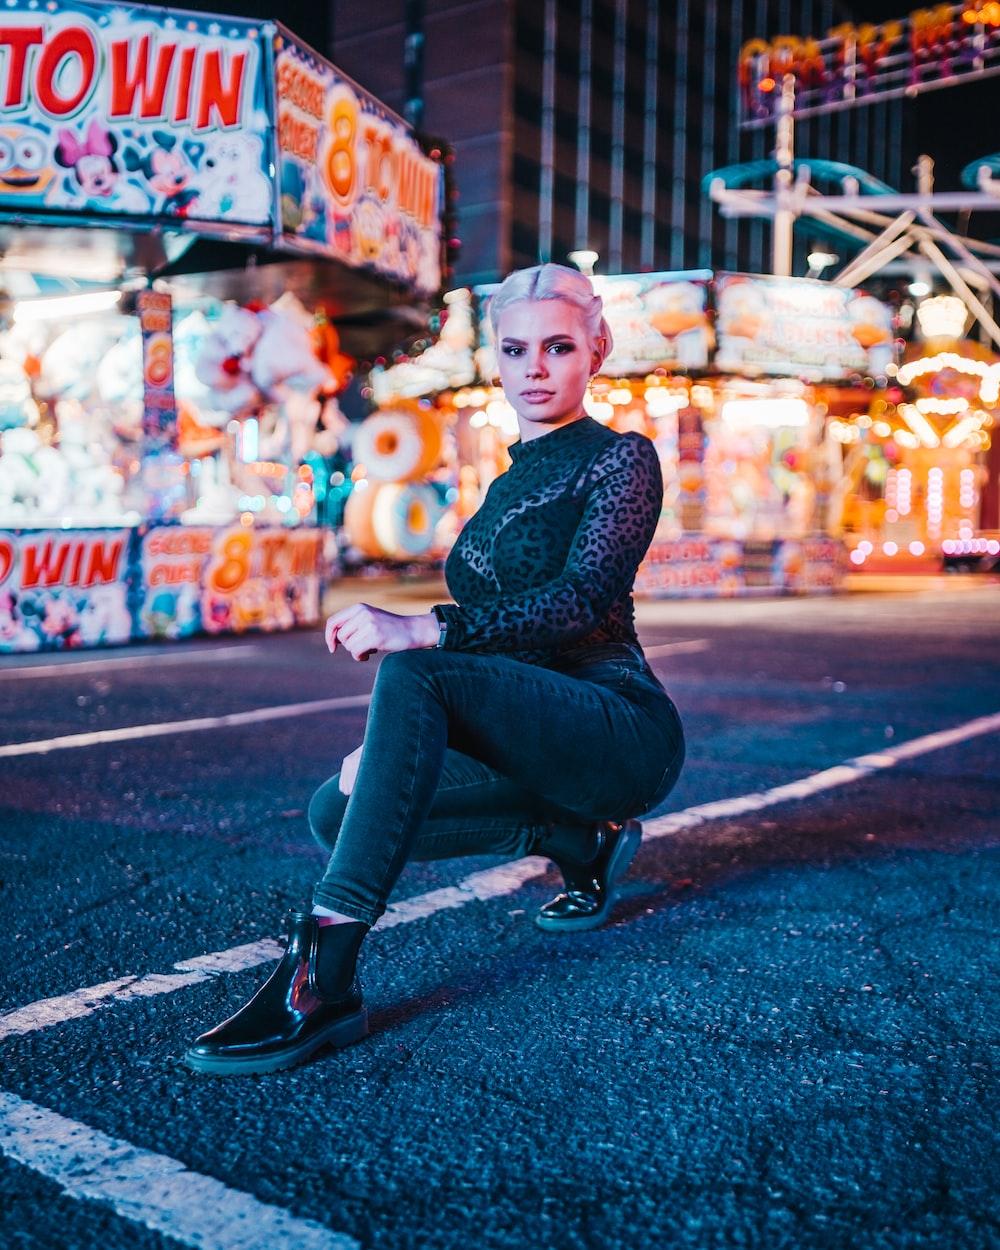 woman sitting on road near amusement park at night